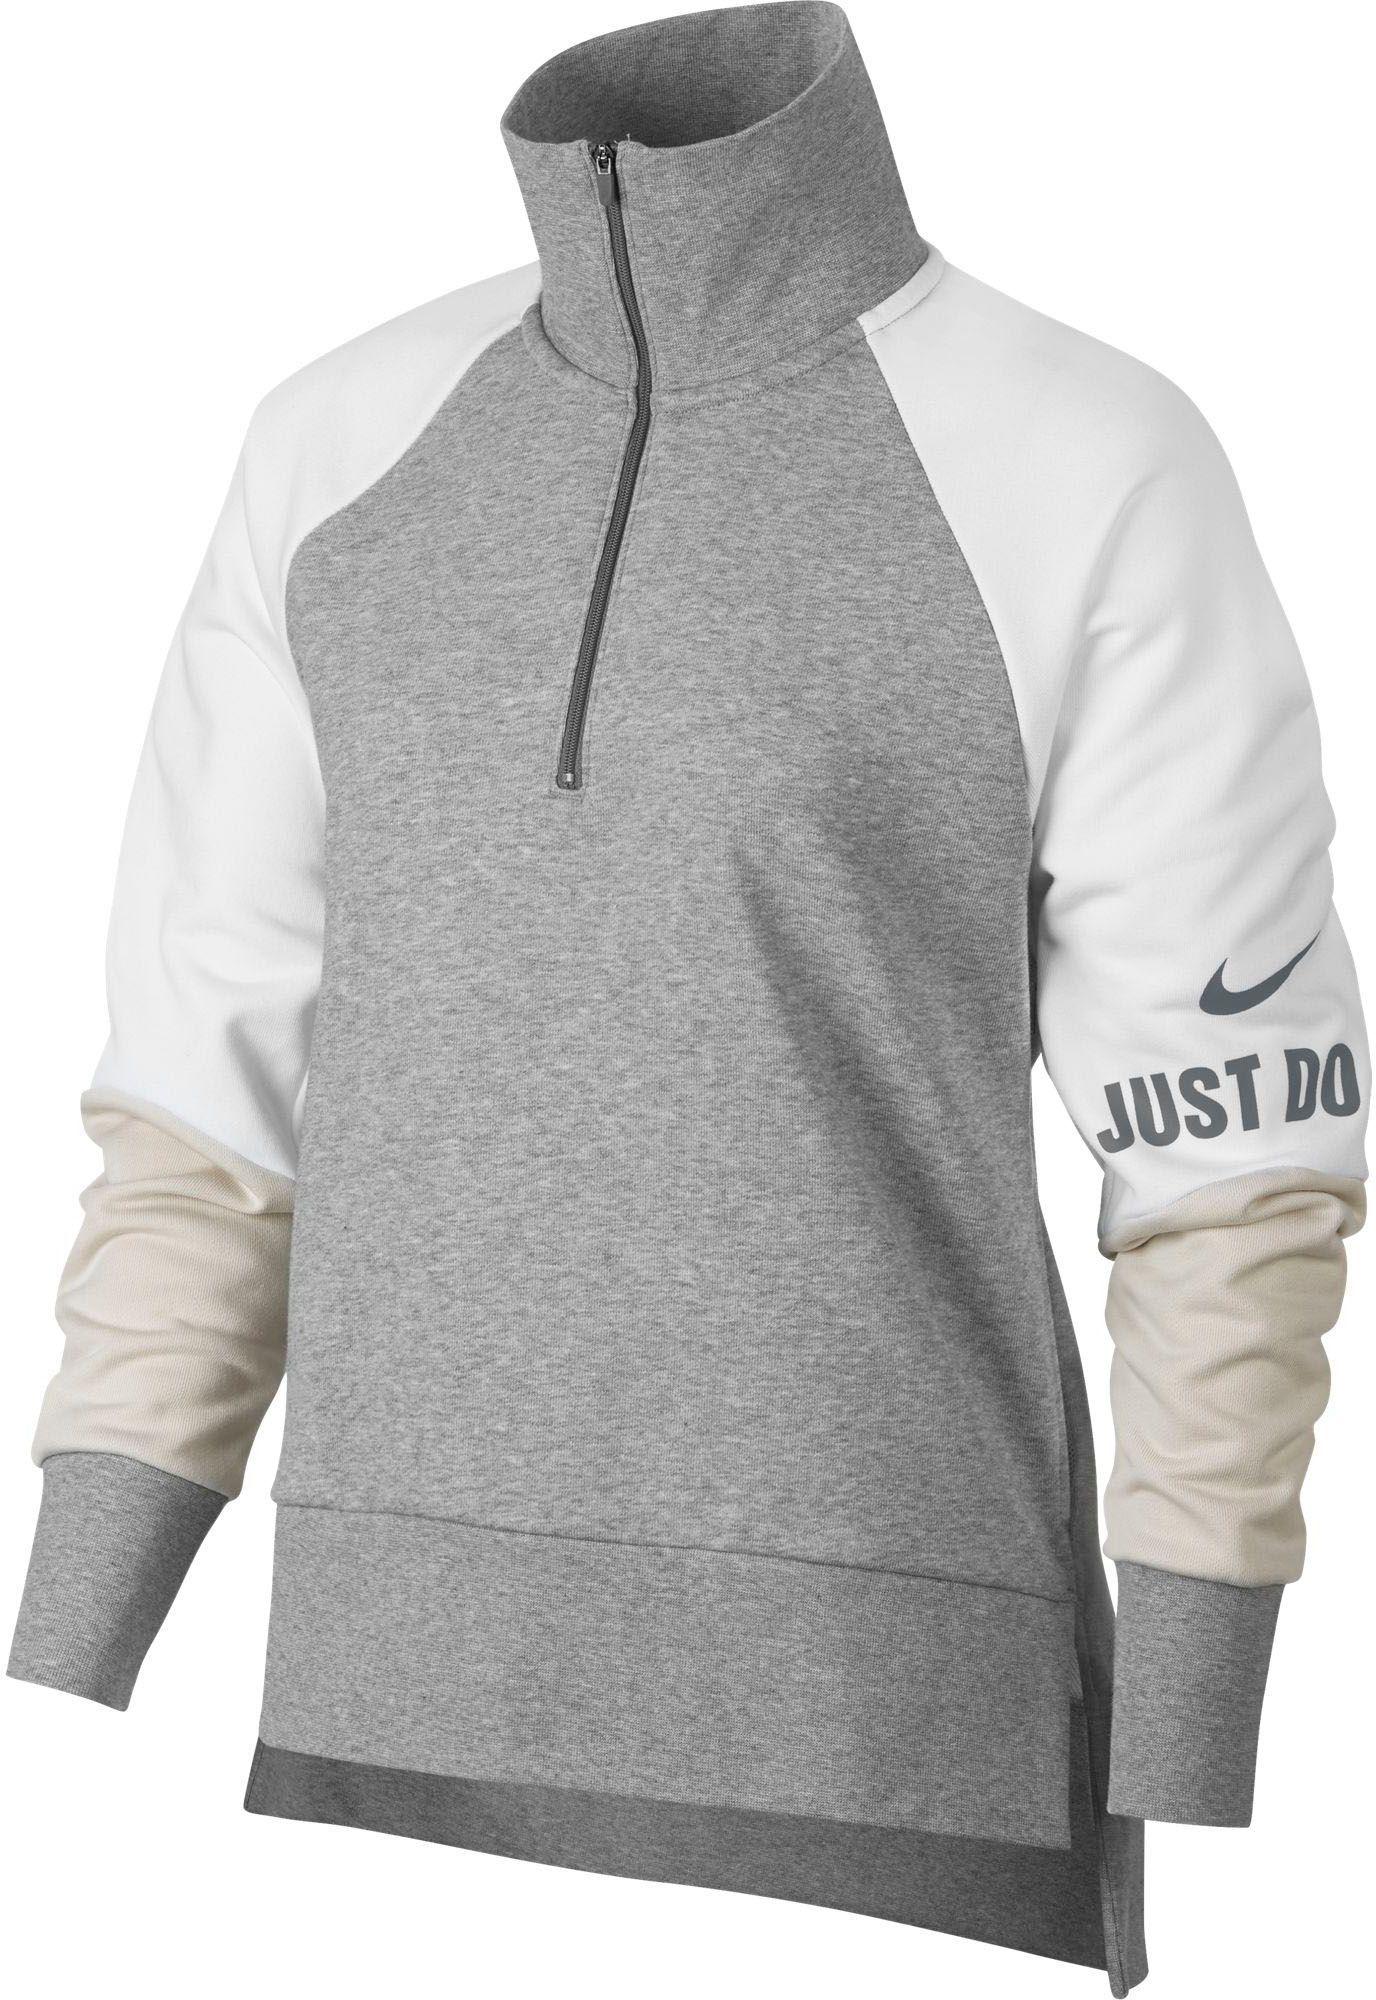 b69d8bbda4623 Nike Women's Dry Colorblock Endurance Half-Zip Training Pullover, Dk Grey  Heather/White